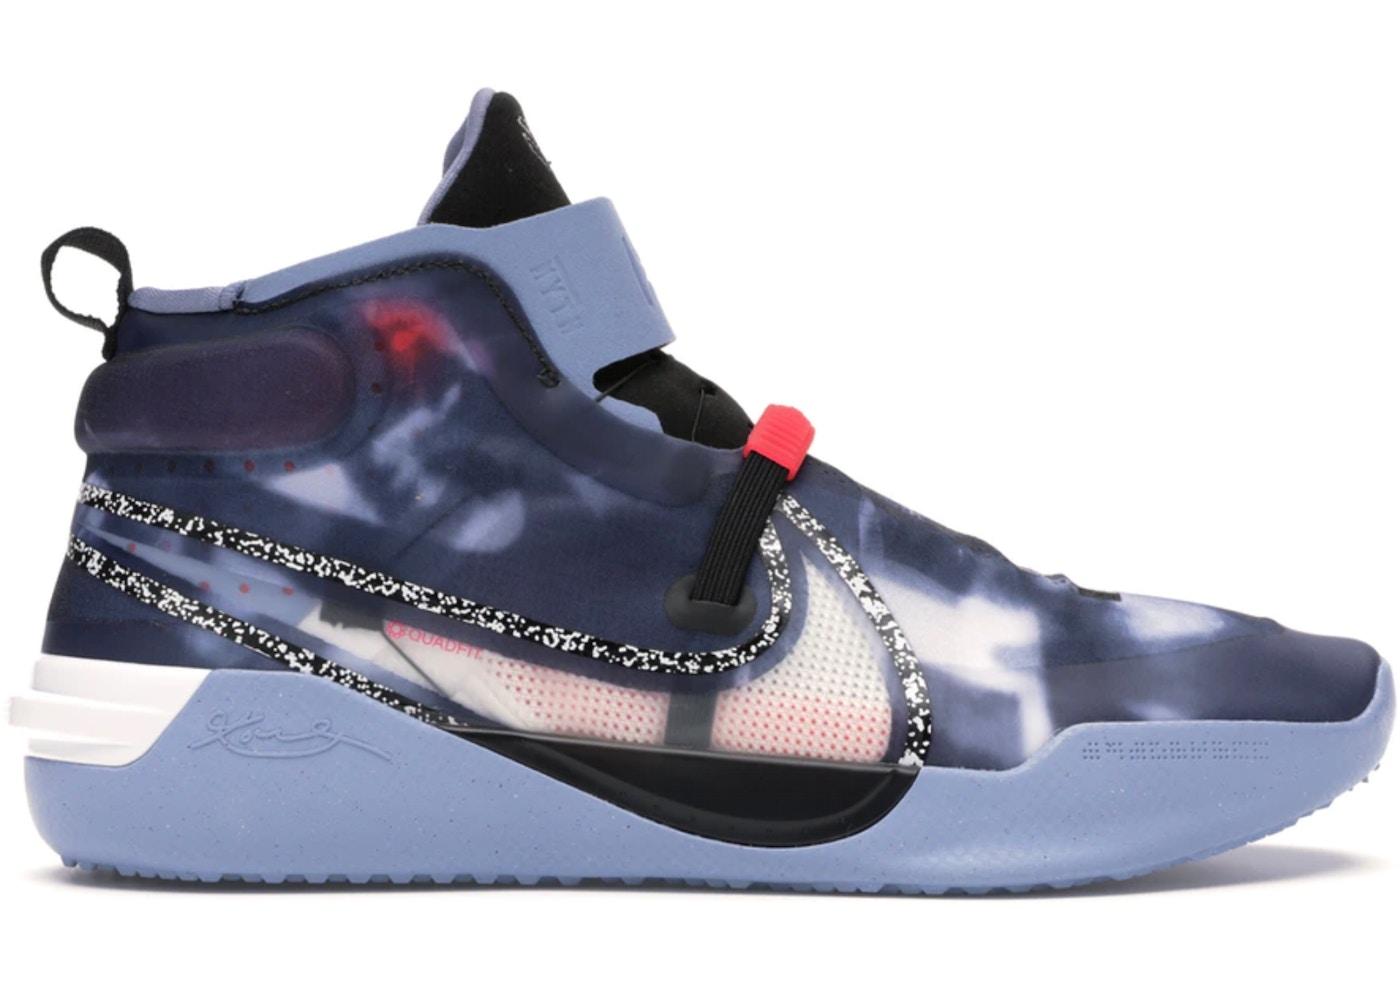 scarpe classiche Vendita scontata 2019 le più votate più recenti Nike Kobe AD NXT FF Vast Grey Blue Hero - CD0458-900